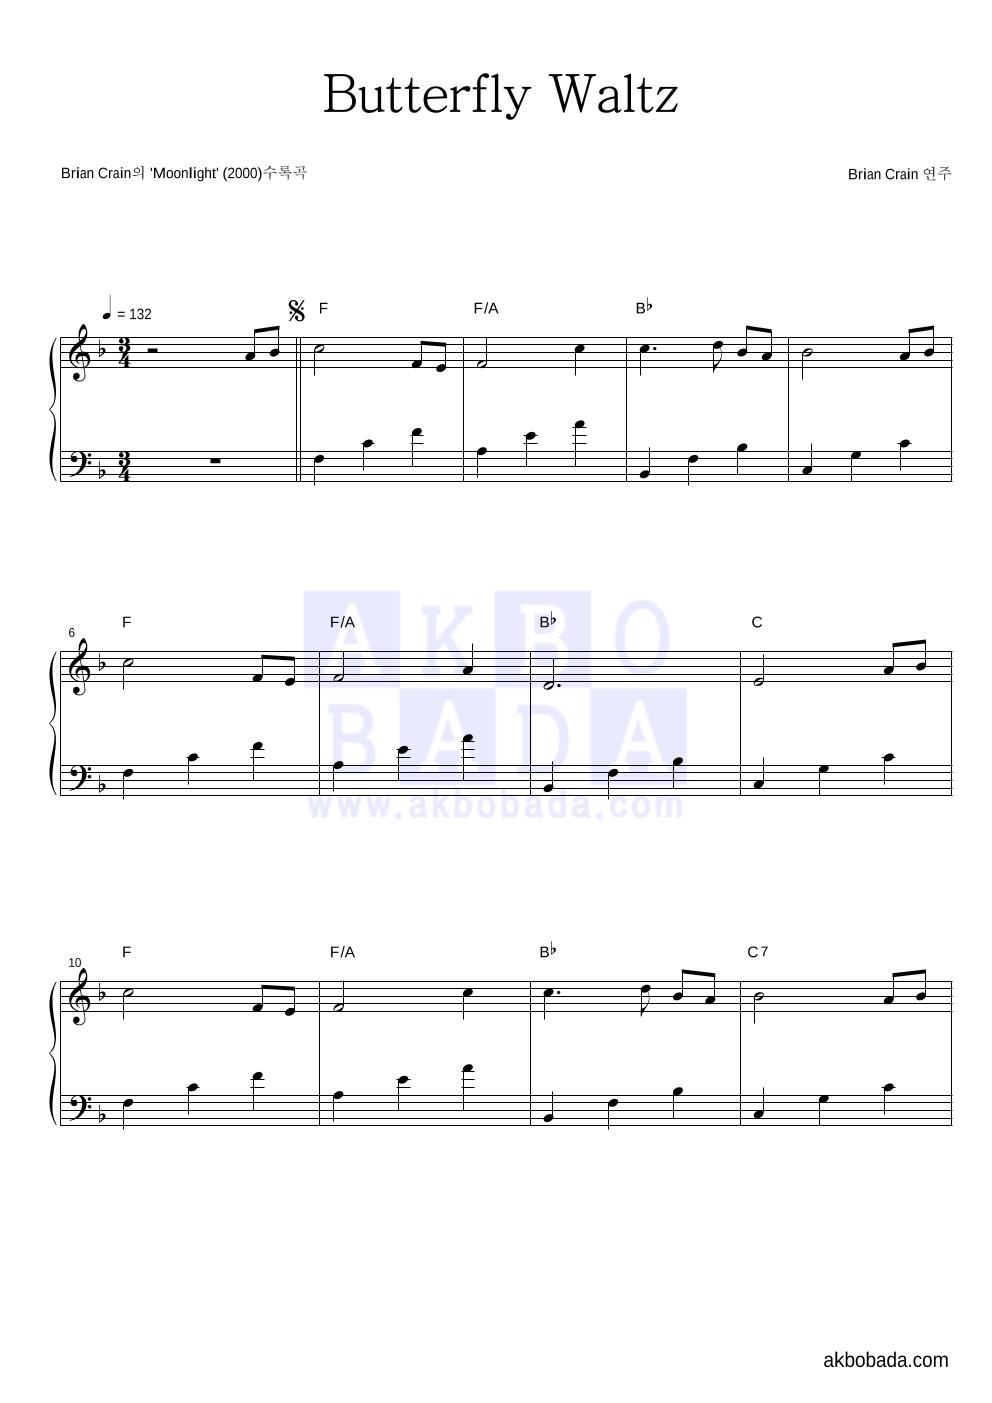 Brian Crain - Butterfly Waltz 피아노 2단 악보